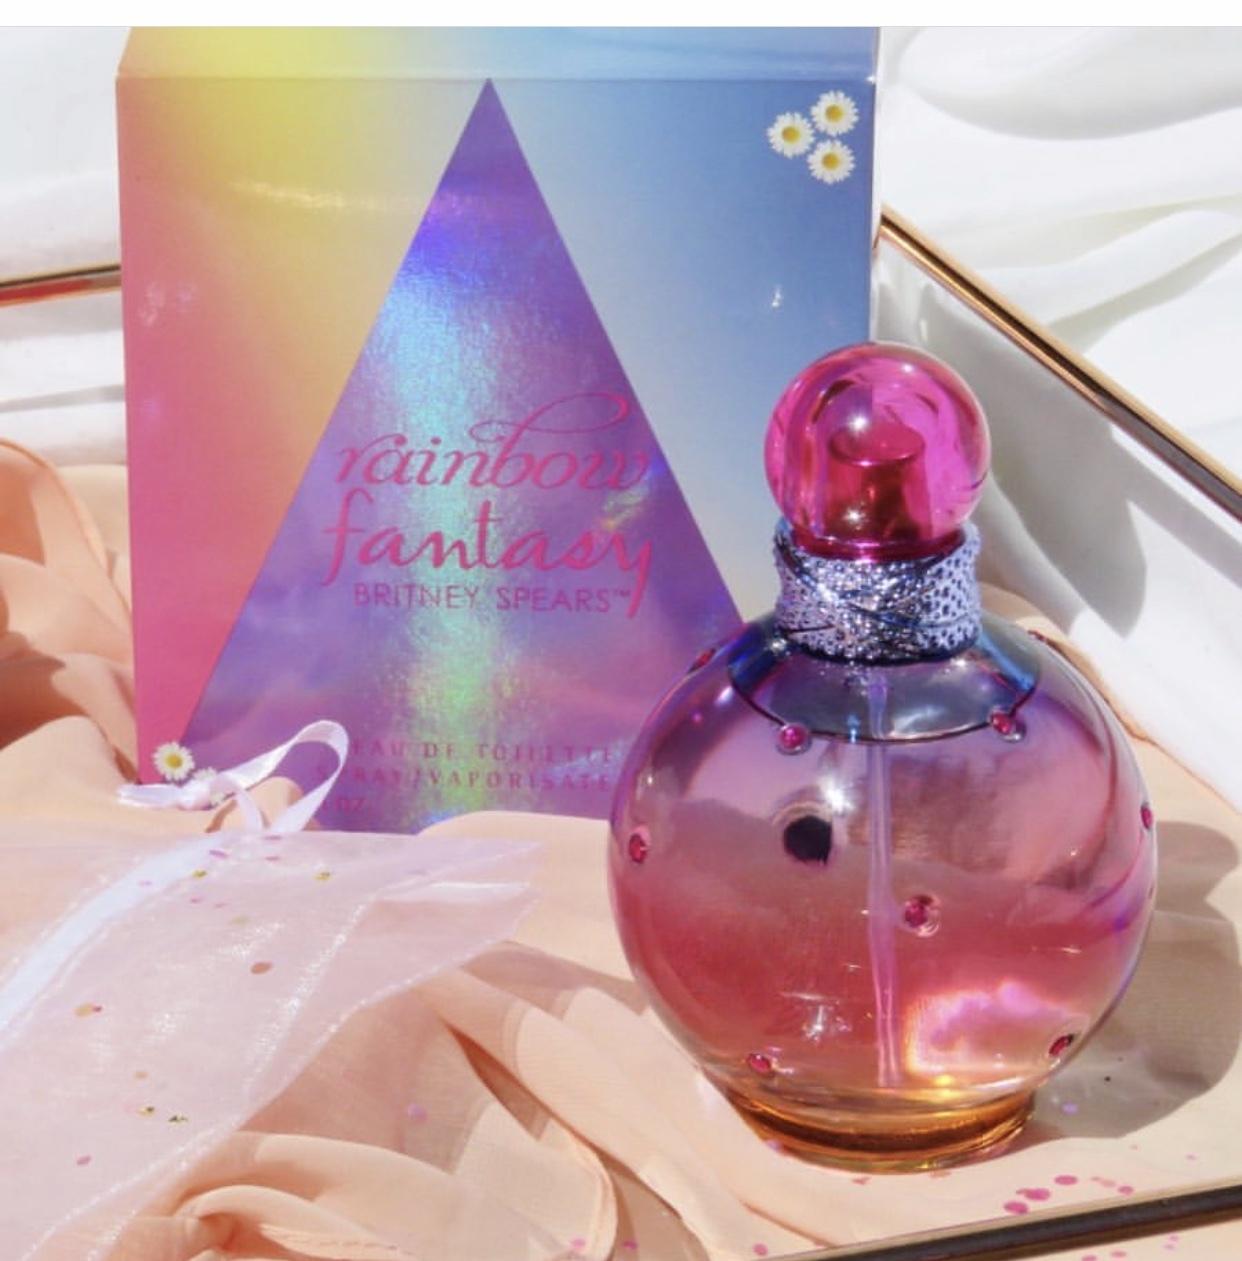 111b6cedd8fc Britney Spears Rainbow Fantasy Perfume reviews in Perfume - ChickAdvisor